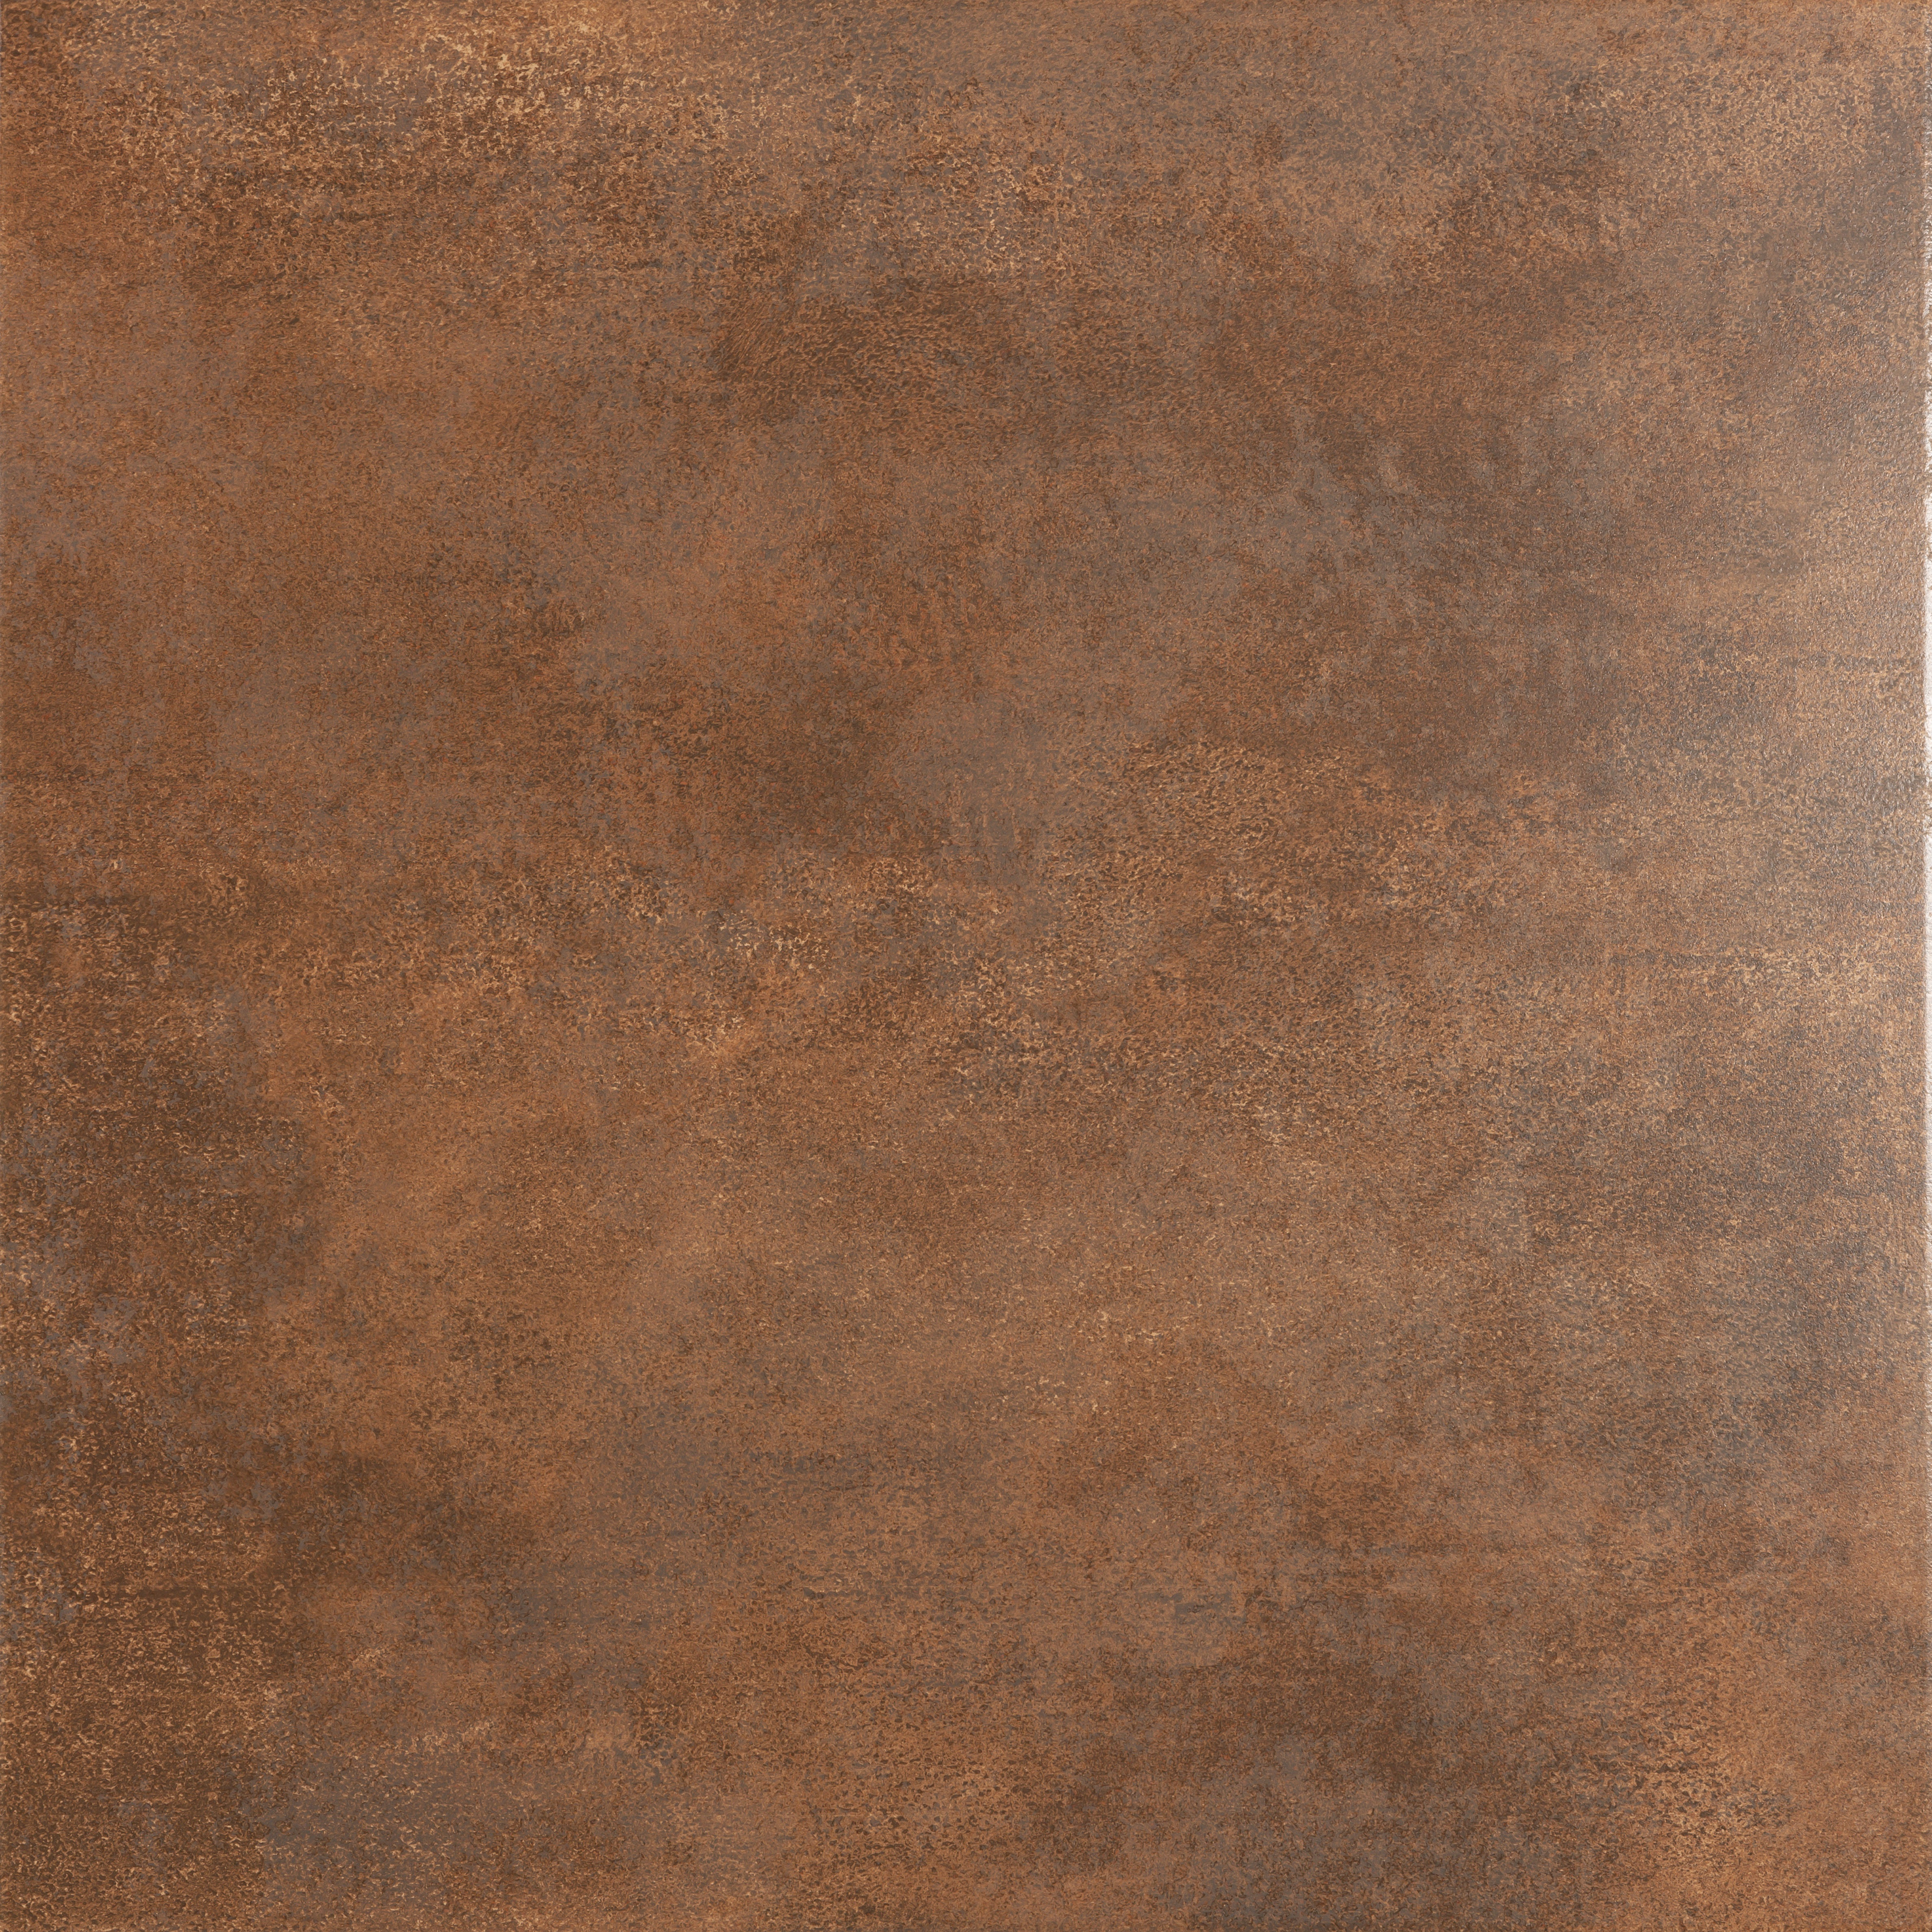 Cooper oxido R9 60x60 - Hansas Plaadimaailm